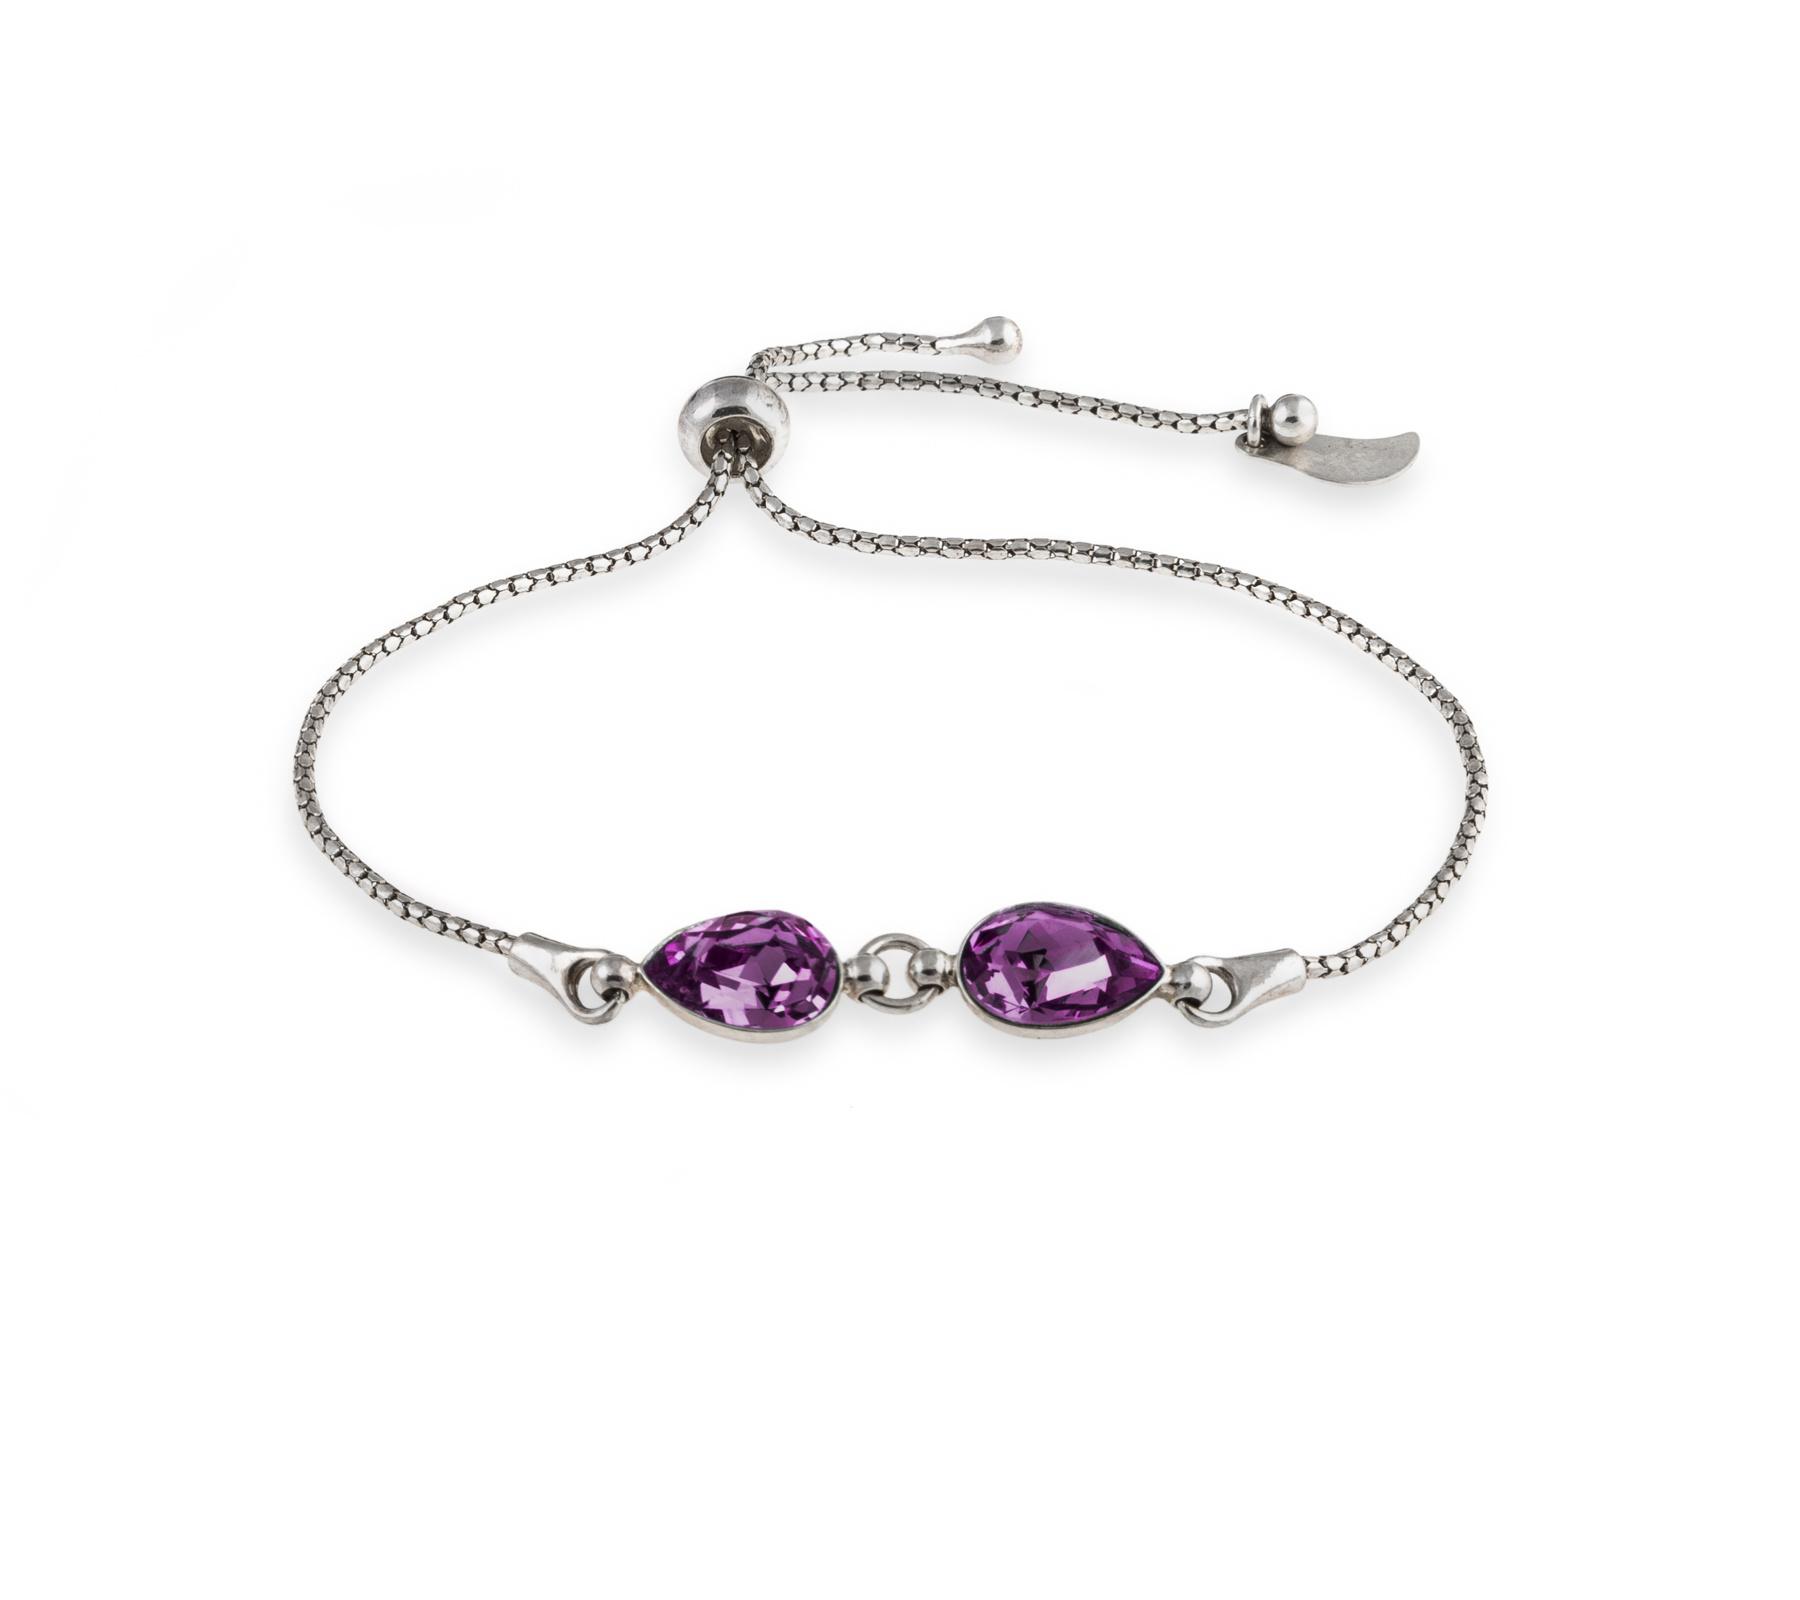 Bracelet with Swarovski crystals-3